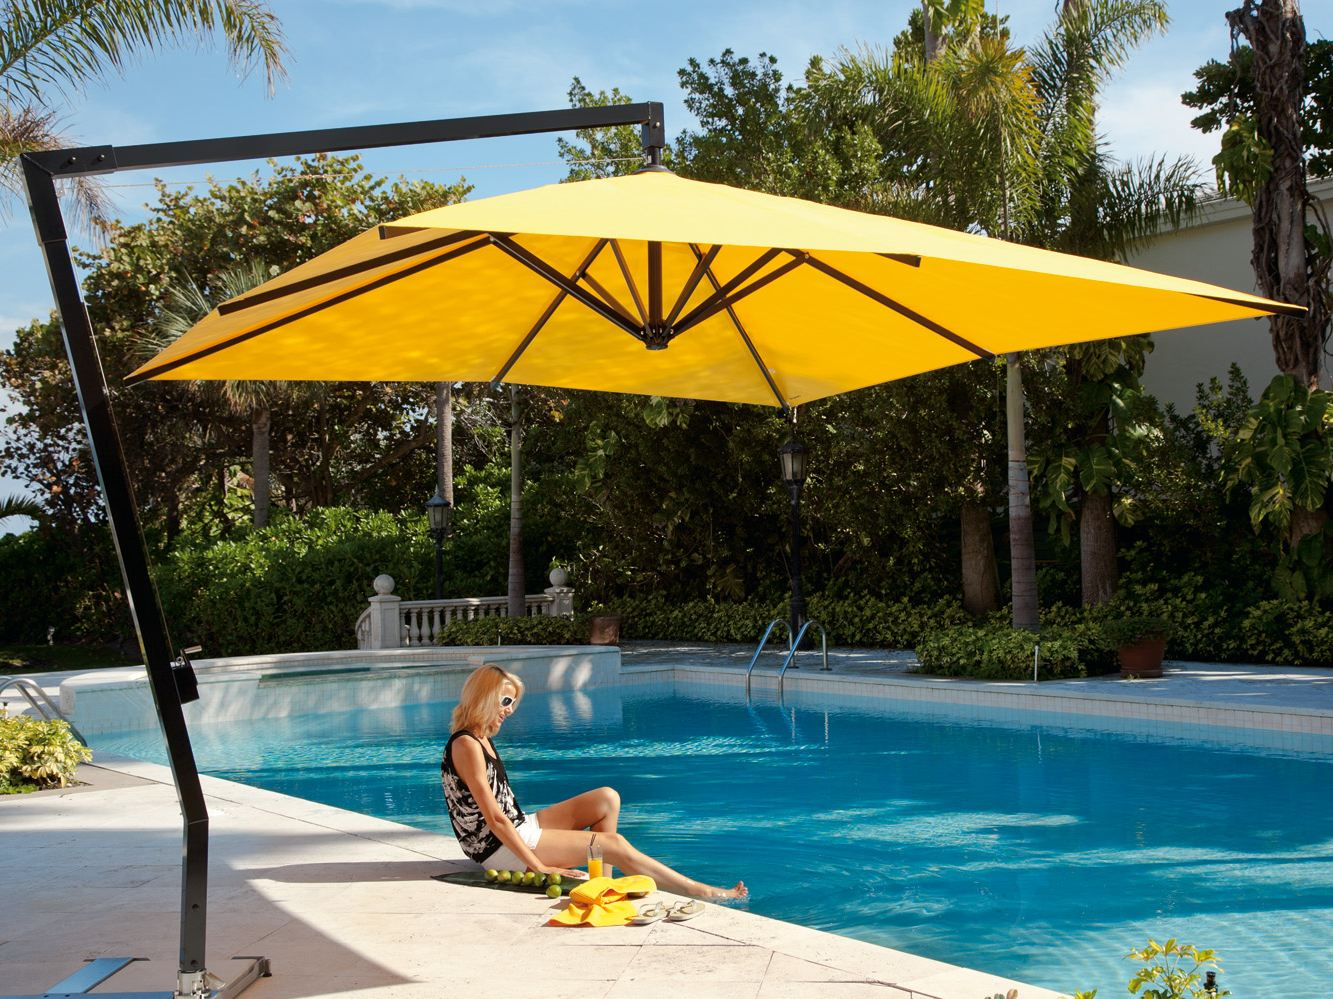 Amalfi square garden umbrella by michael caravita - Recambio tela parasol ...